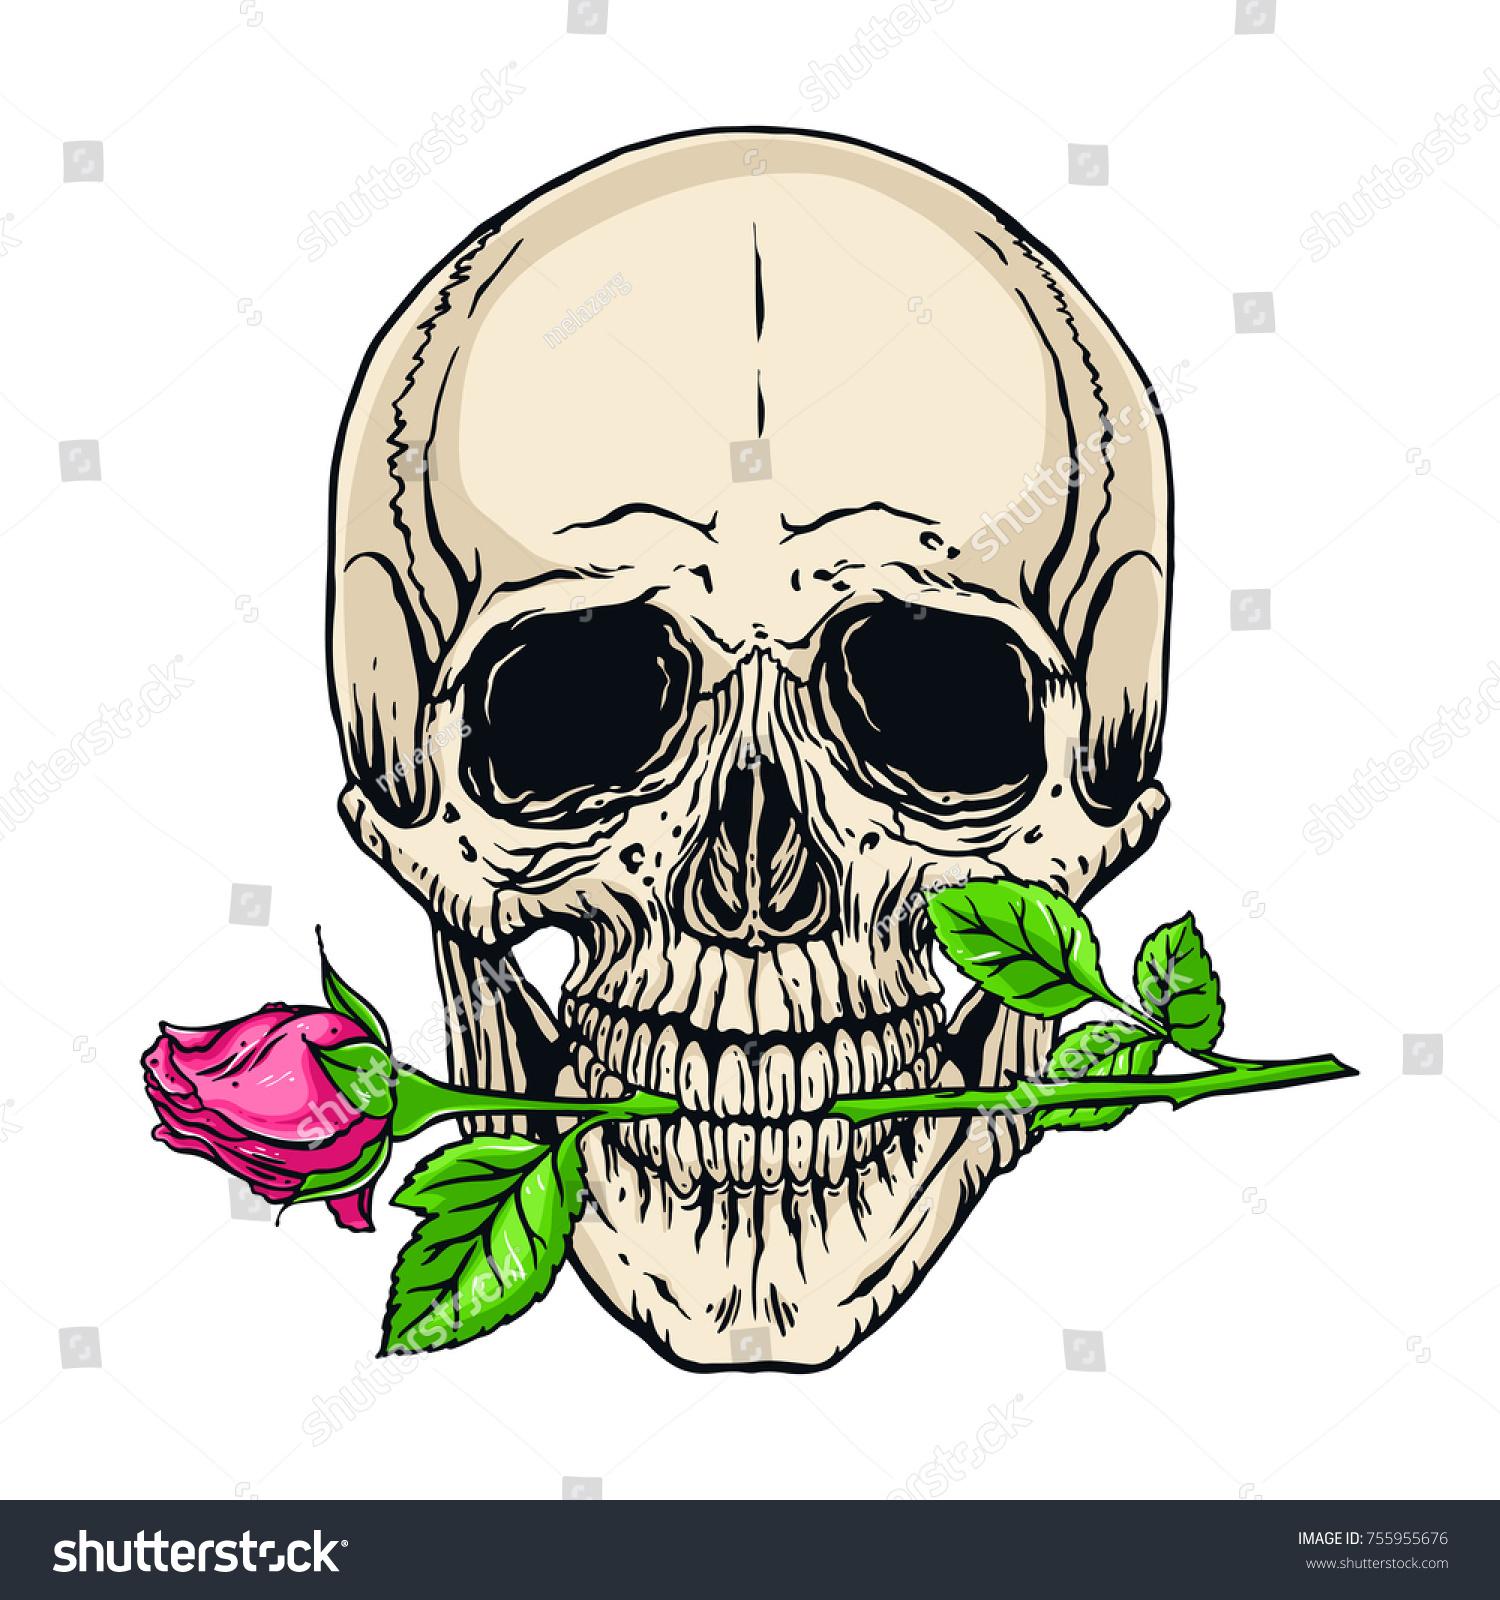 Hand Drawn Illustration Anatomy Human Skull Vectores En Stock ...